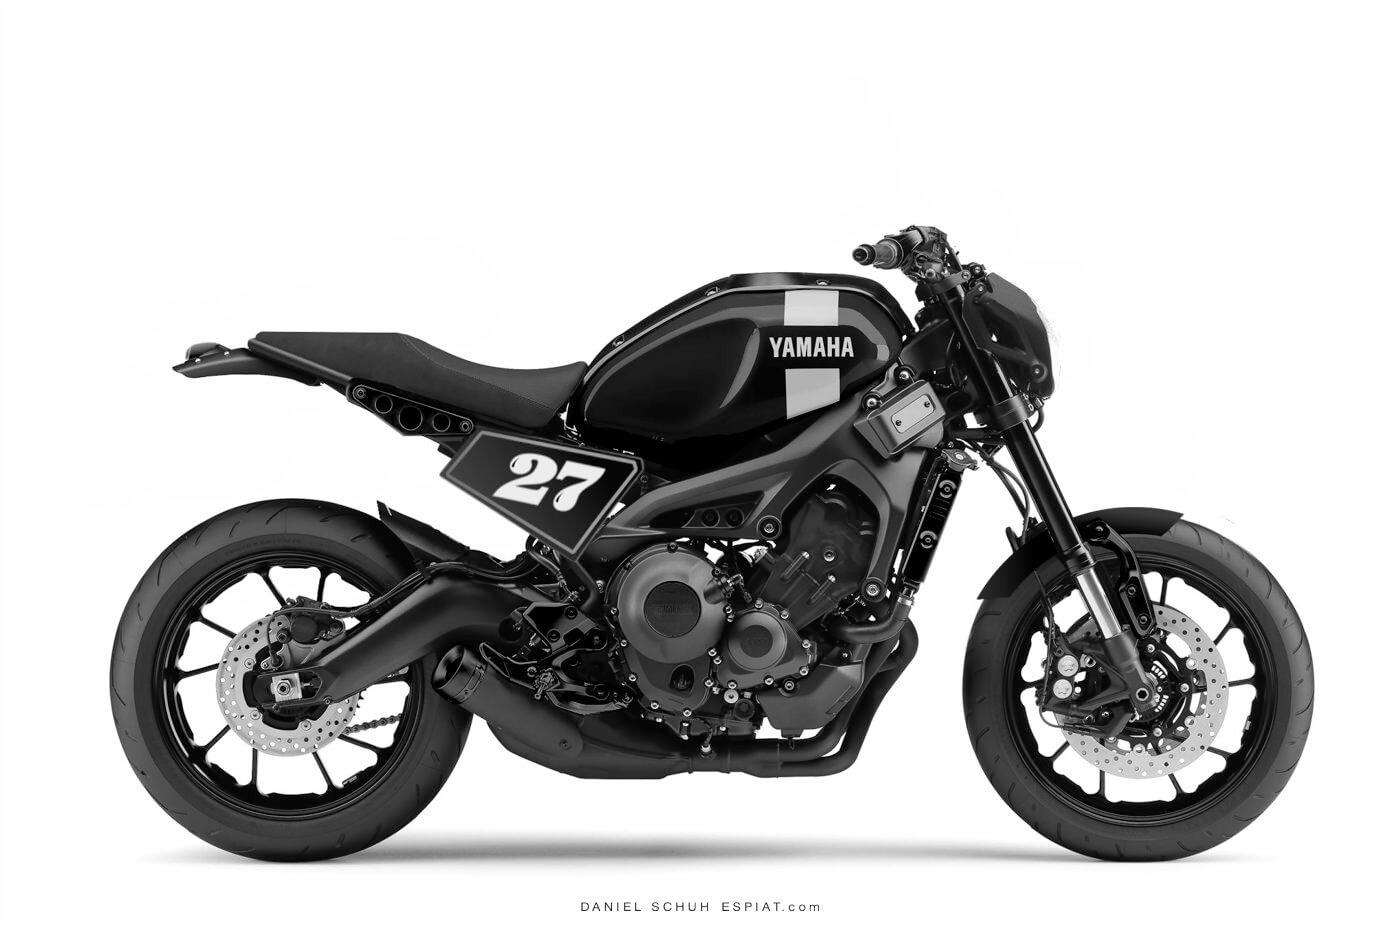 Yamaha-XSR900-cafe-racer-custom-bike-espiat-daniel-schuh